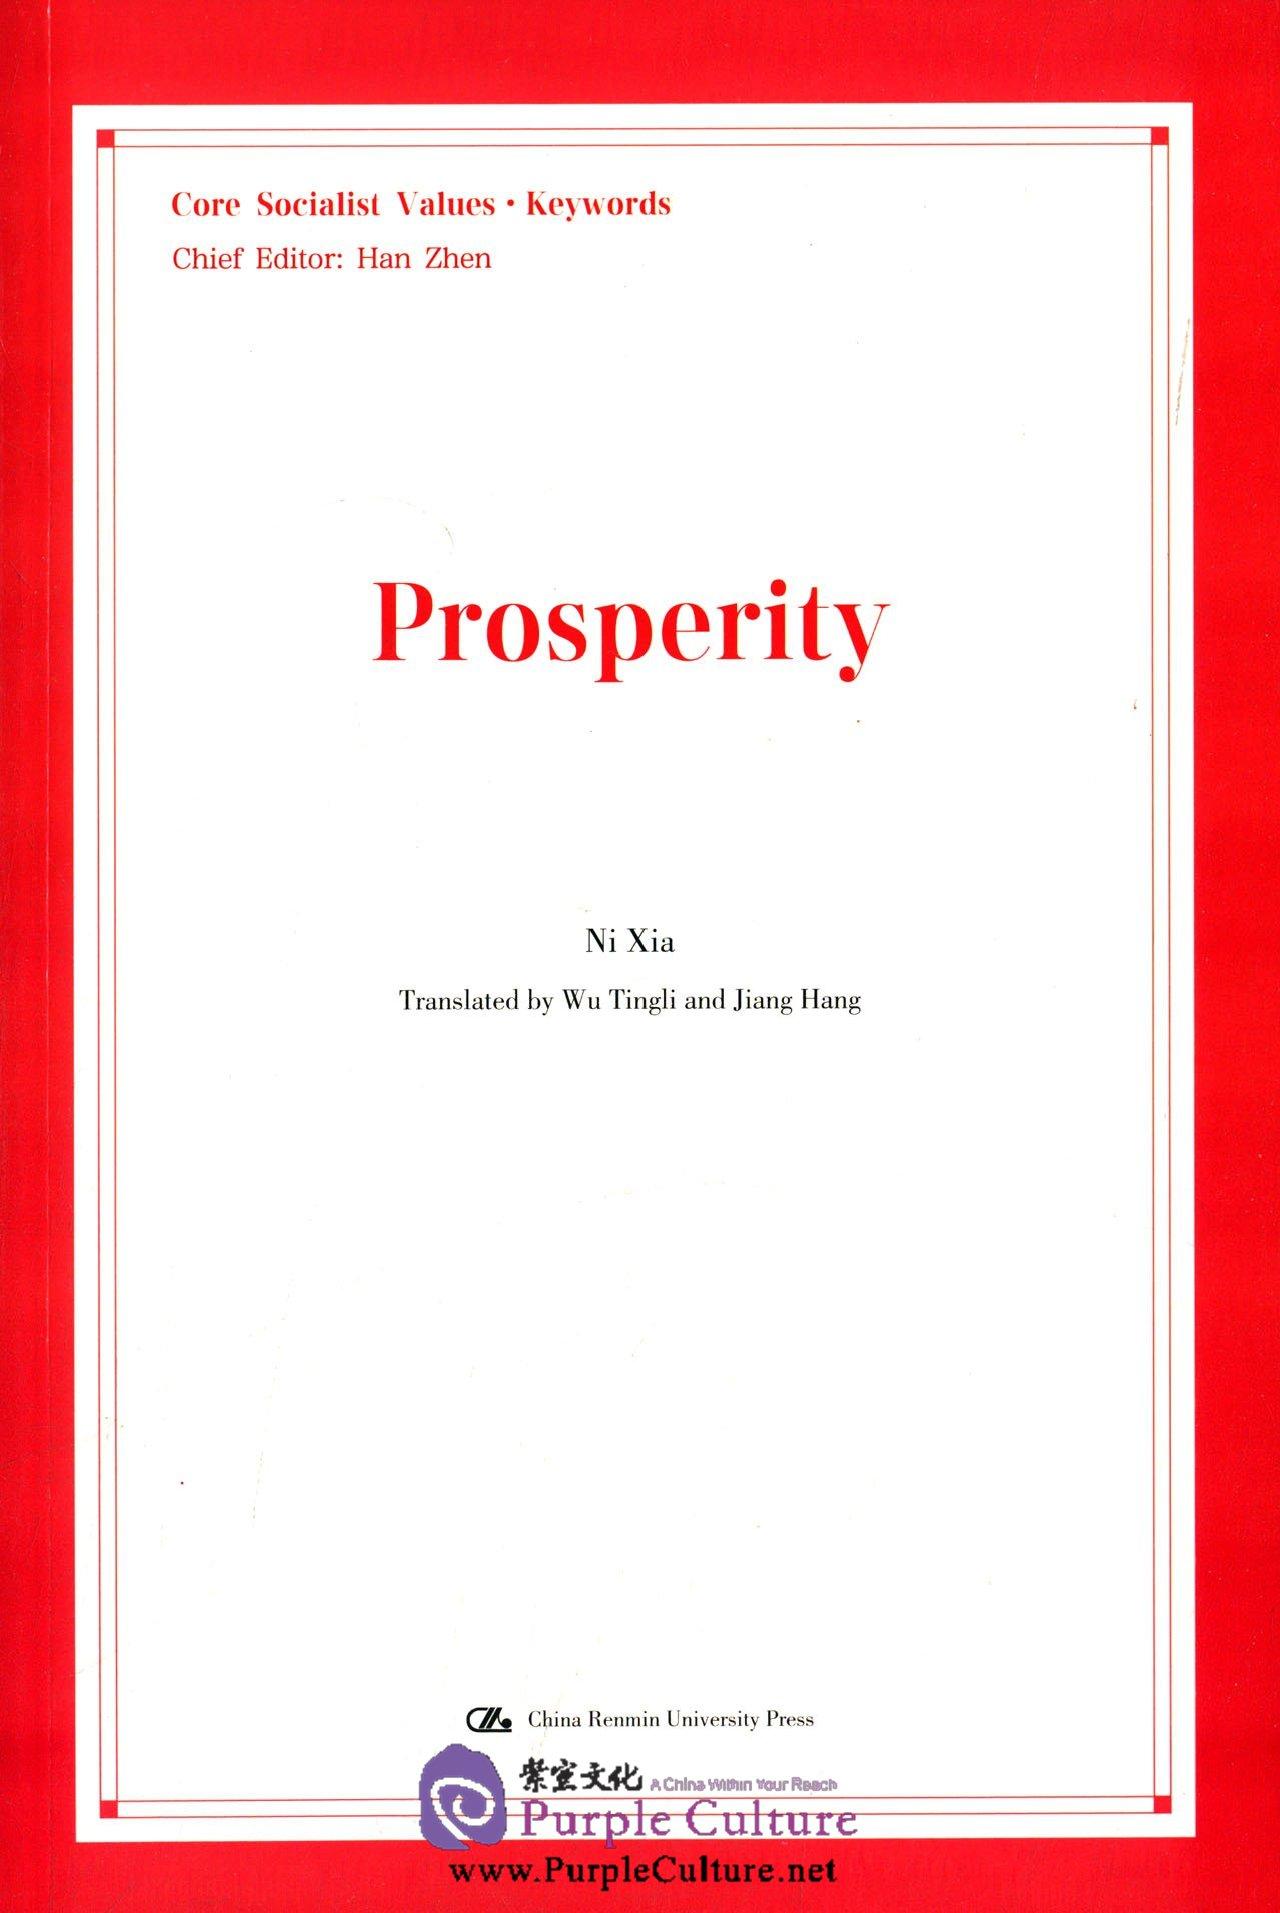 Core Socialist Values Keywords Prosperity By Ni Xia Wu